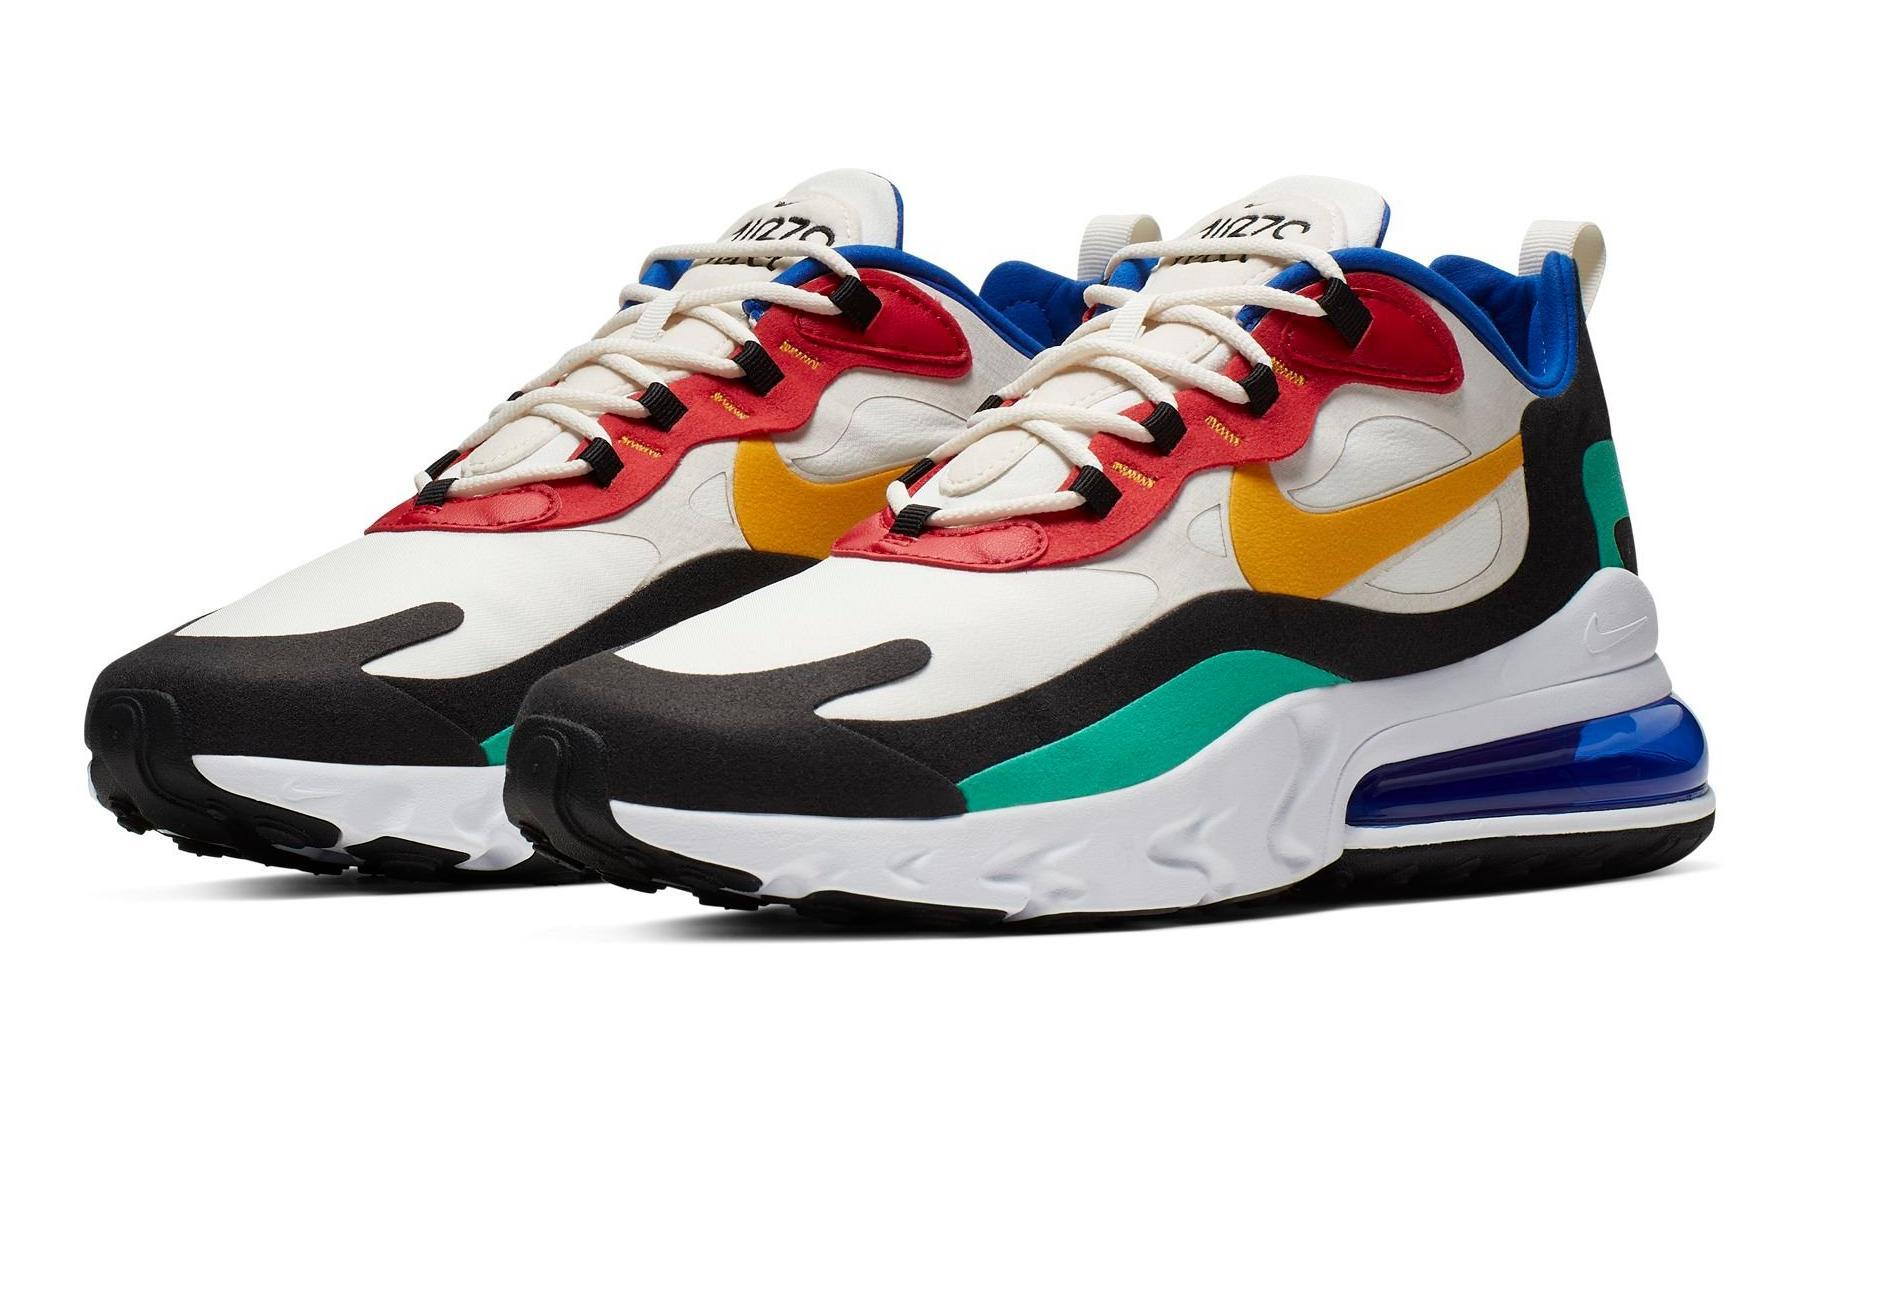 Womens Nike Air Max 1 Comfort Premium Tape Running Shoes OG